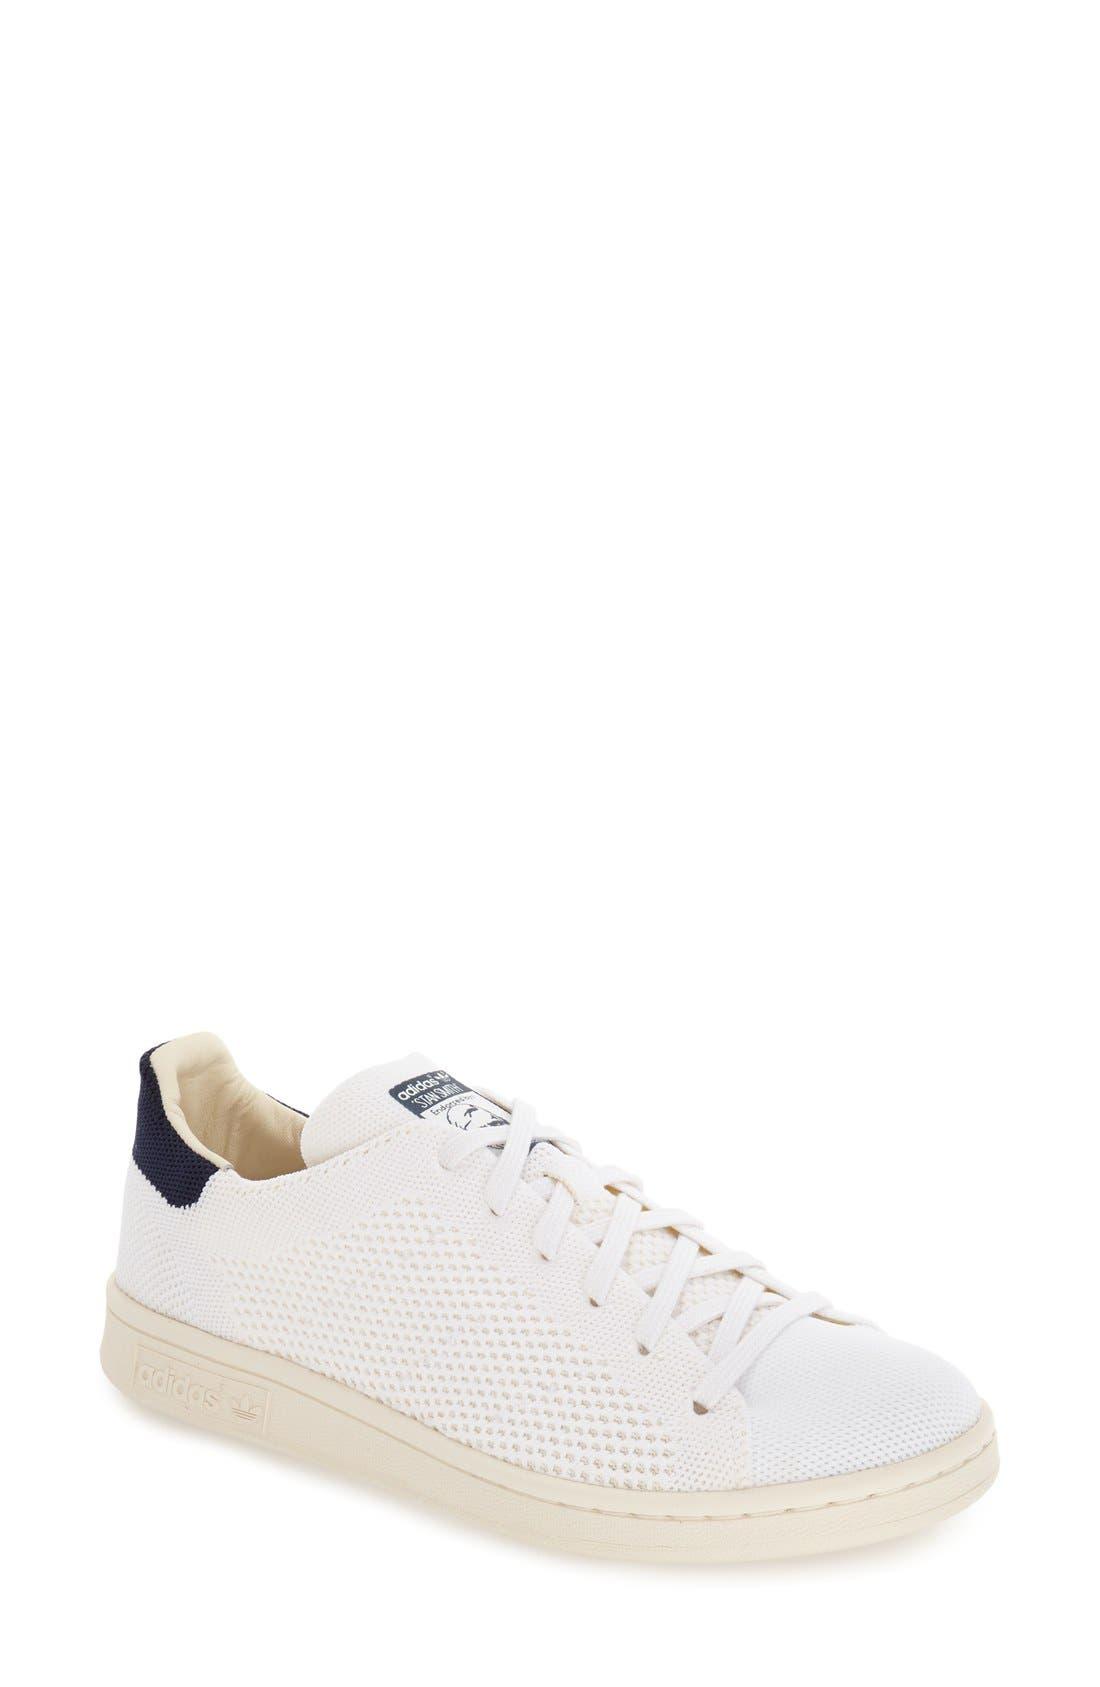 adidas 'Stan Smith' Primeknit Woven Sneaker (Women)